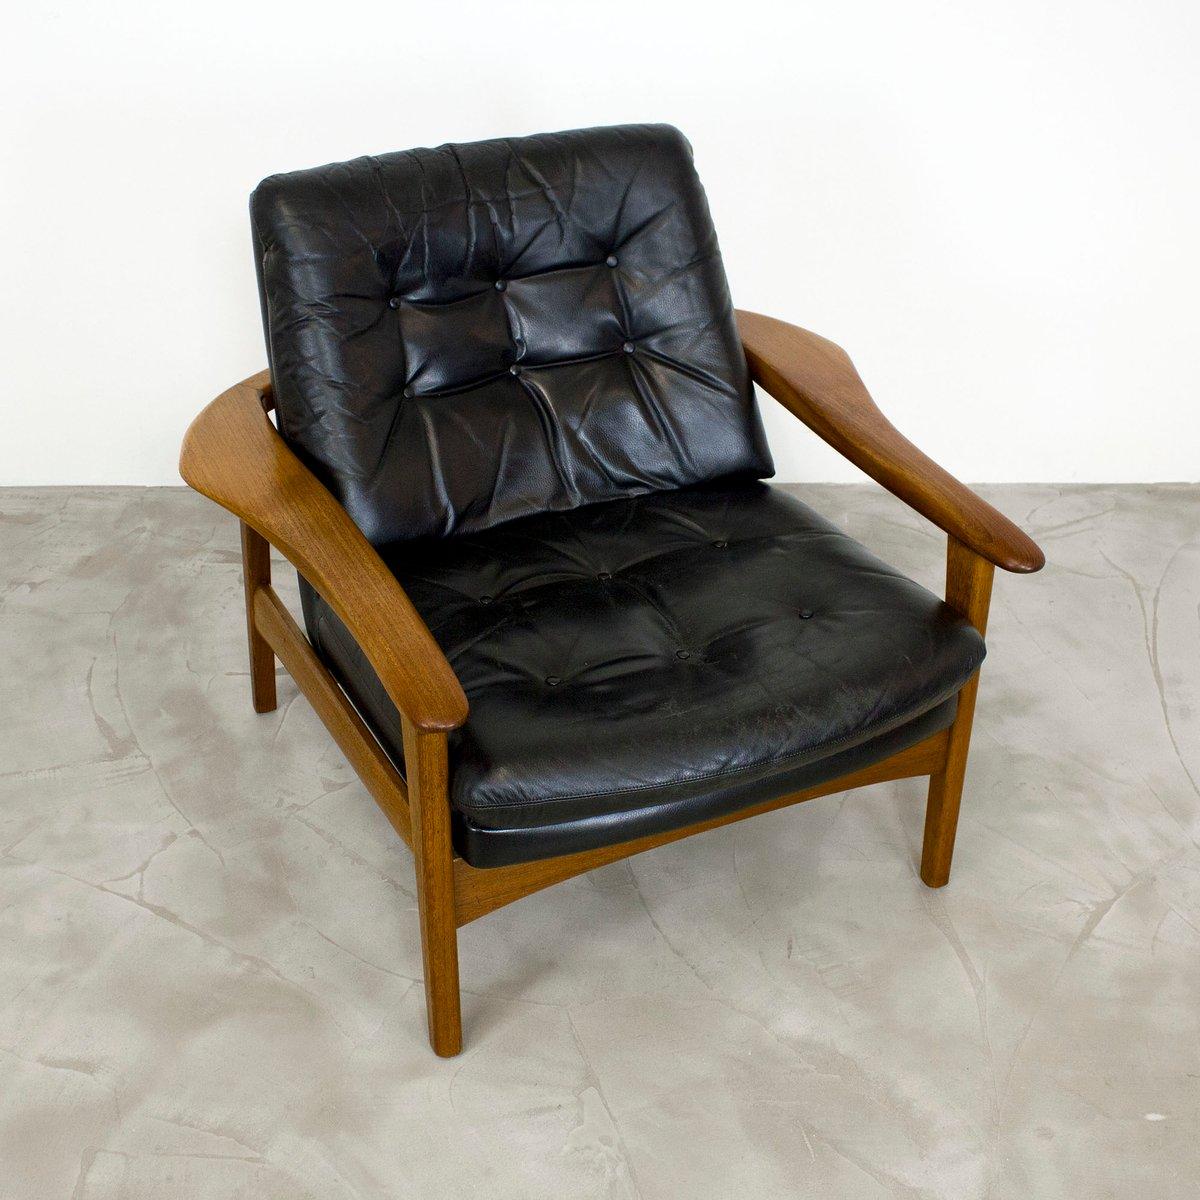 teak u0026 leather lounge chair 1960s - Leather Lounge Chair